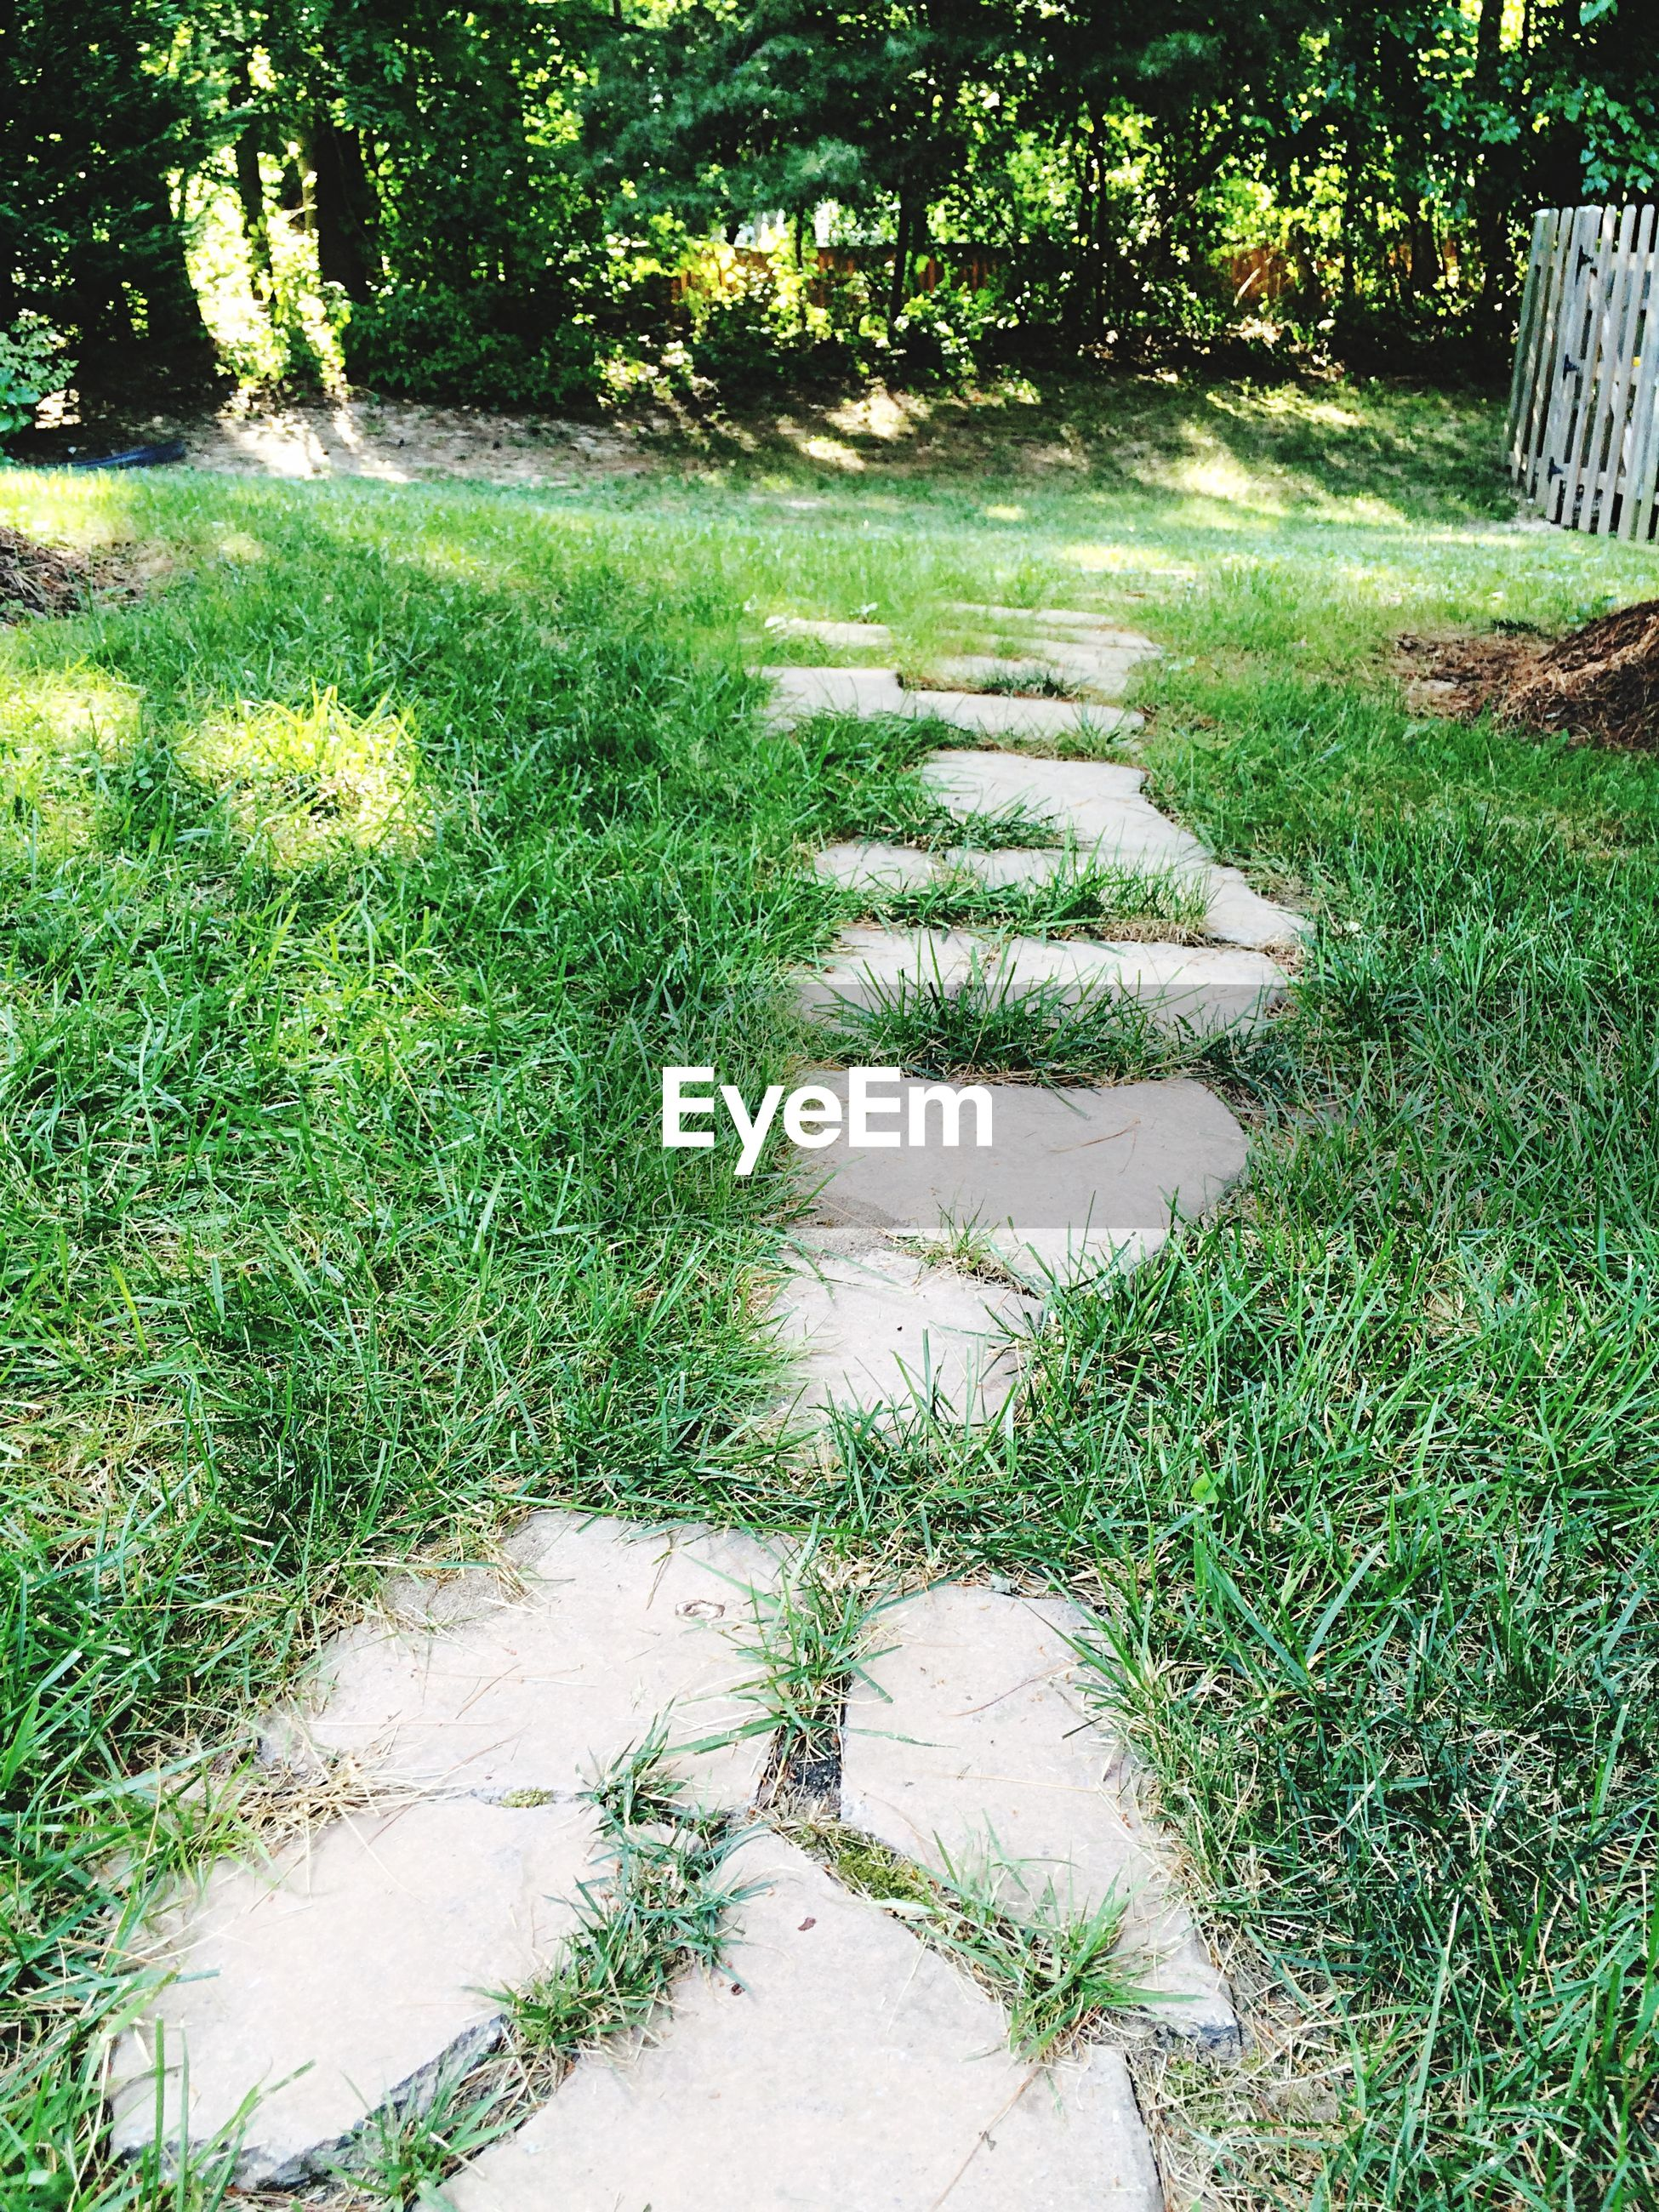 Pathway amidst grassy field